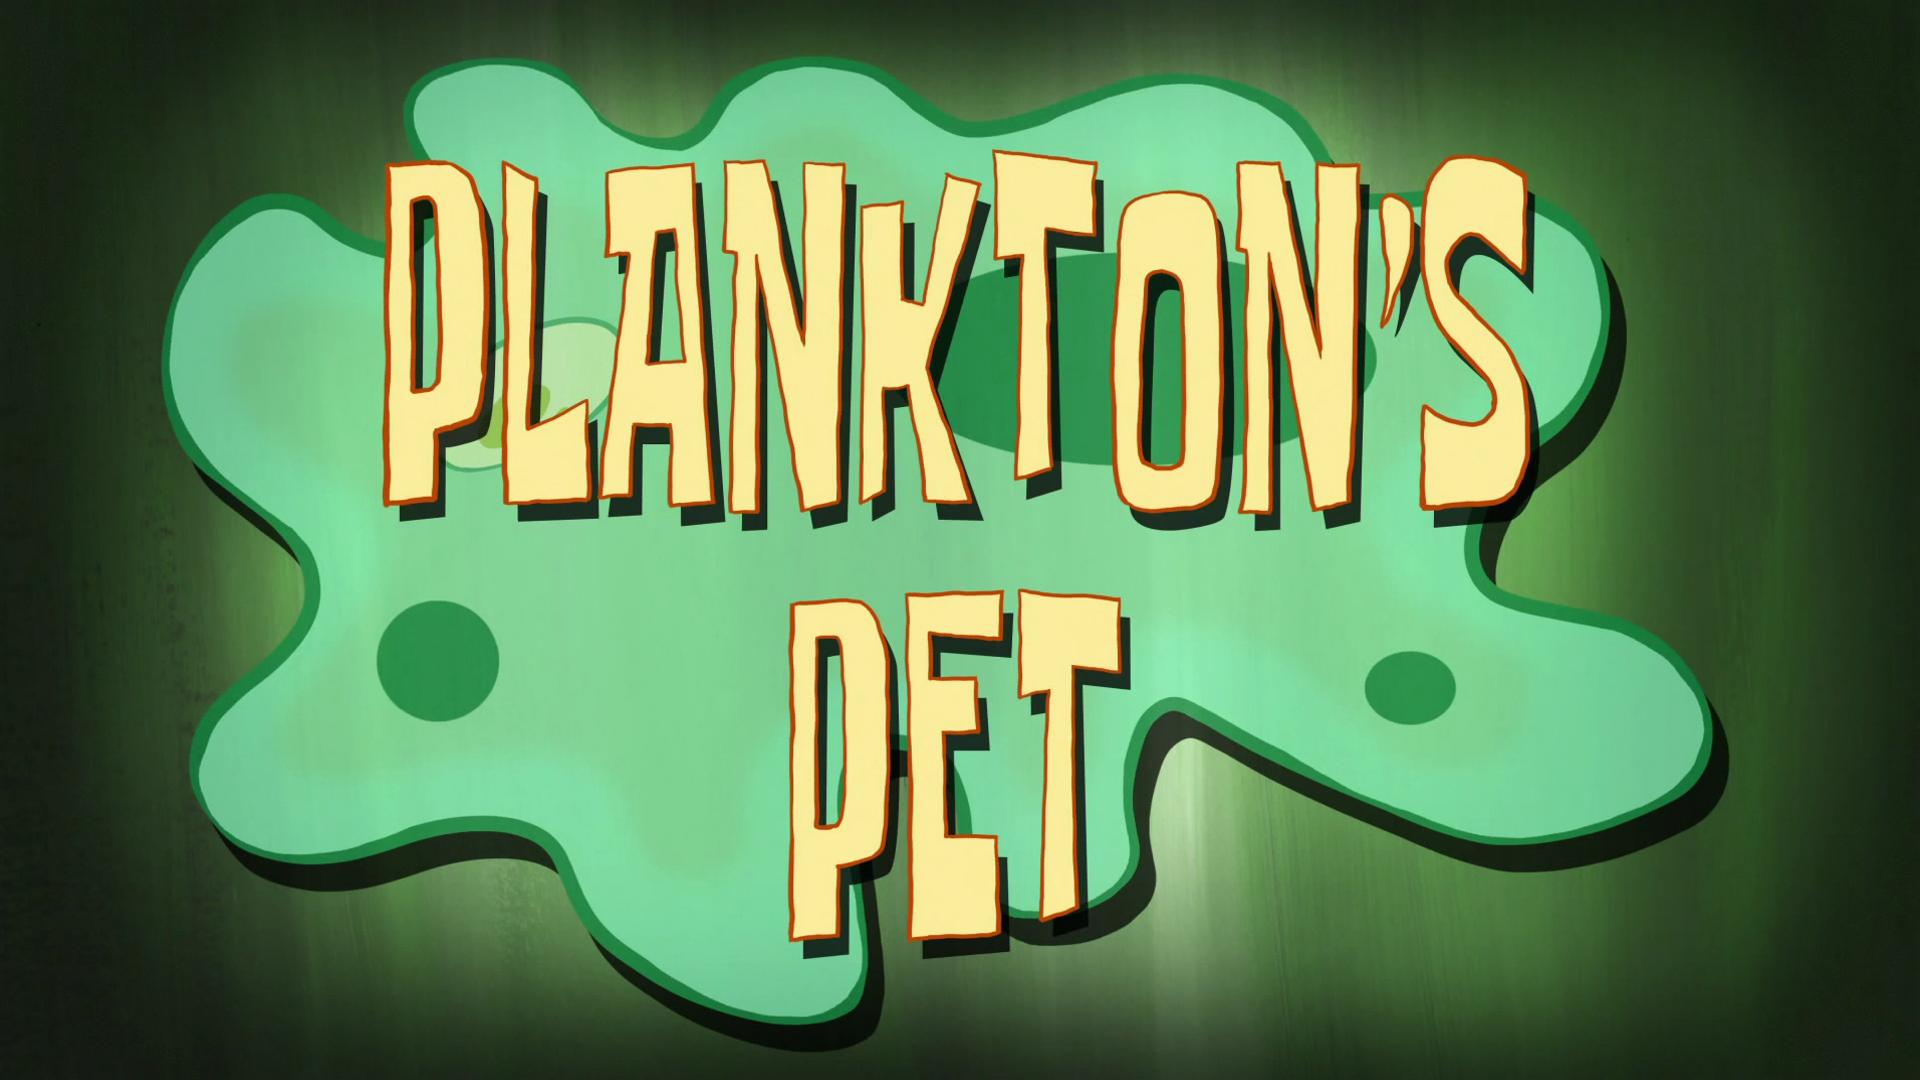 Spongebuddy Mania Spongebob Transcripts Plankton S Pet